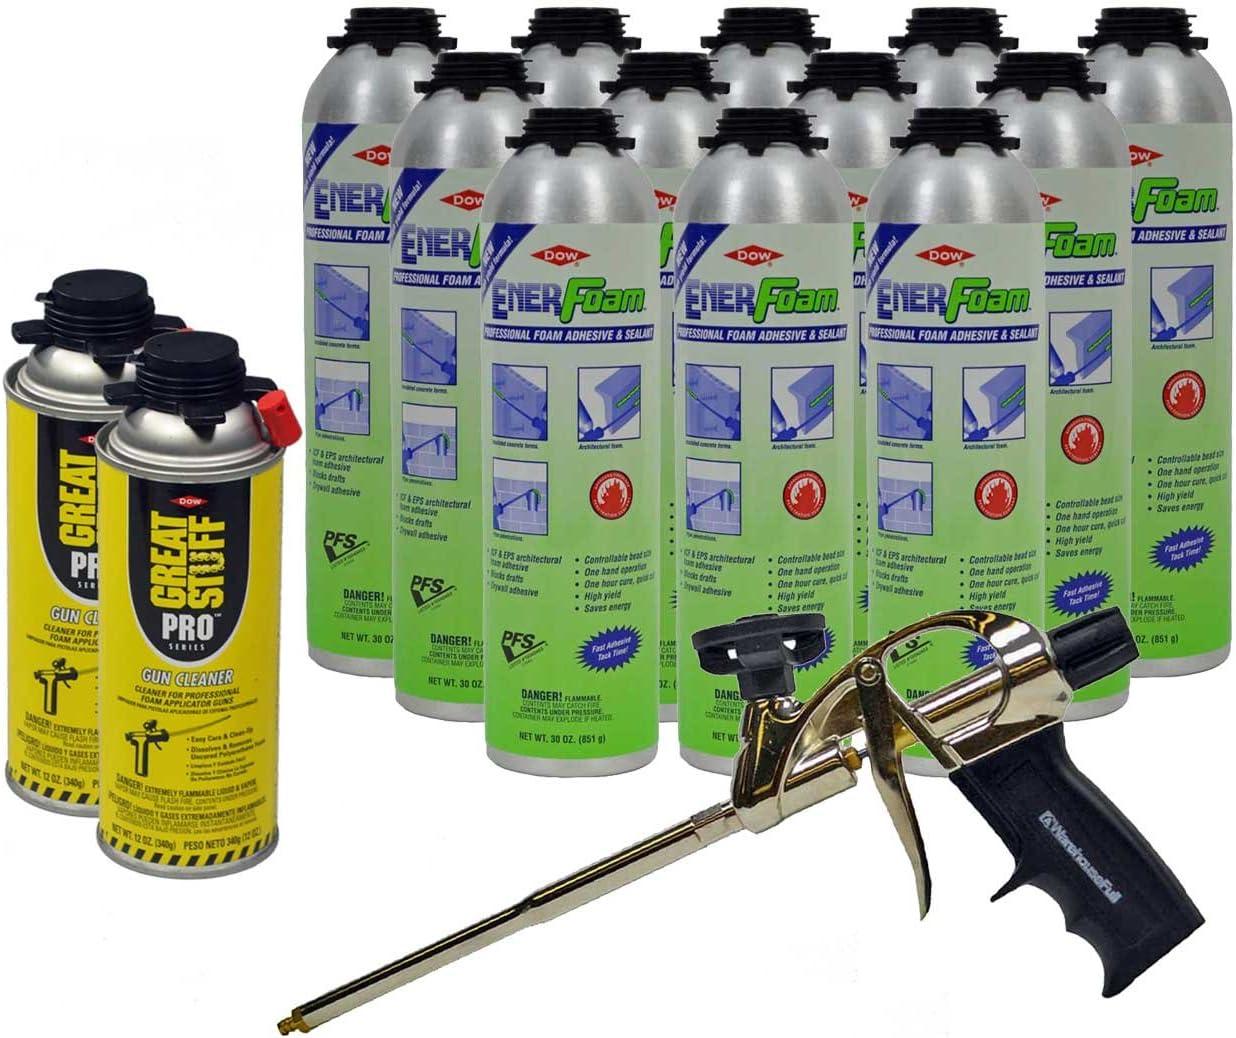 Dow Enerfoam 30oz Gun Dispensed Foam (12) + AWF Pro Foam Gun (1) + Great Stuff Pro Foam Gun Cleaner (2)